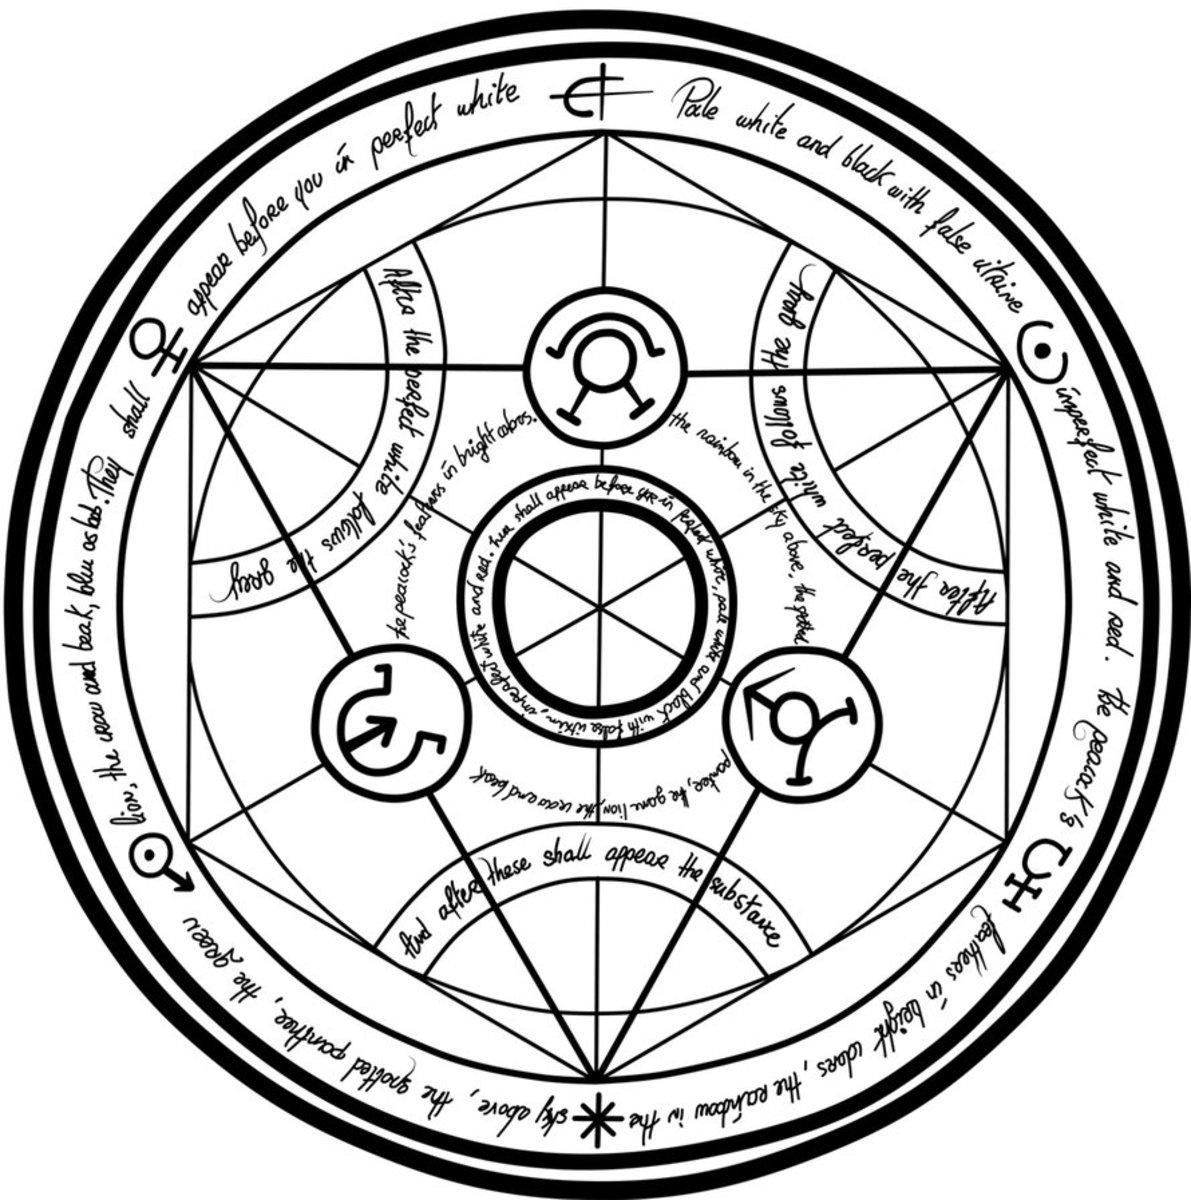 Alchemy from Full Metal Alchemist